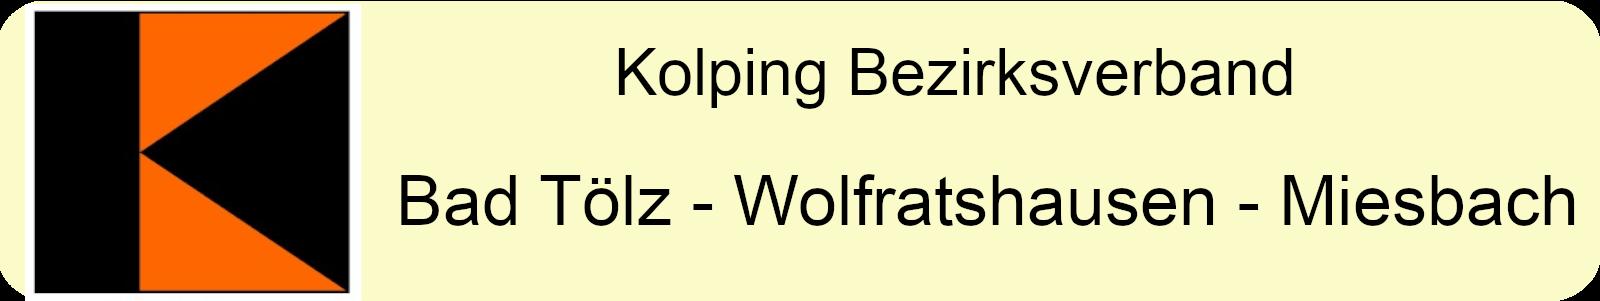 Kolping Bezirksverband Bad Tölz-Wolfratshausen-Miesbach